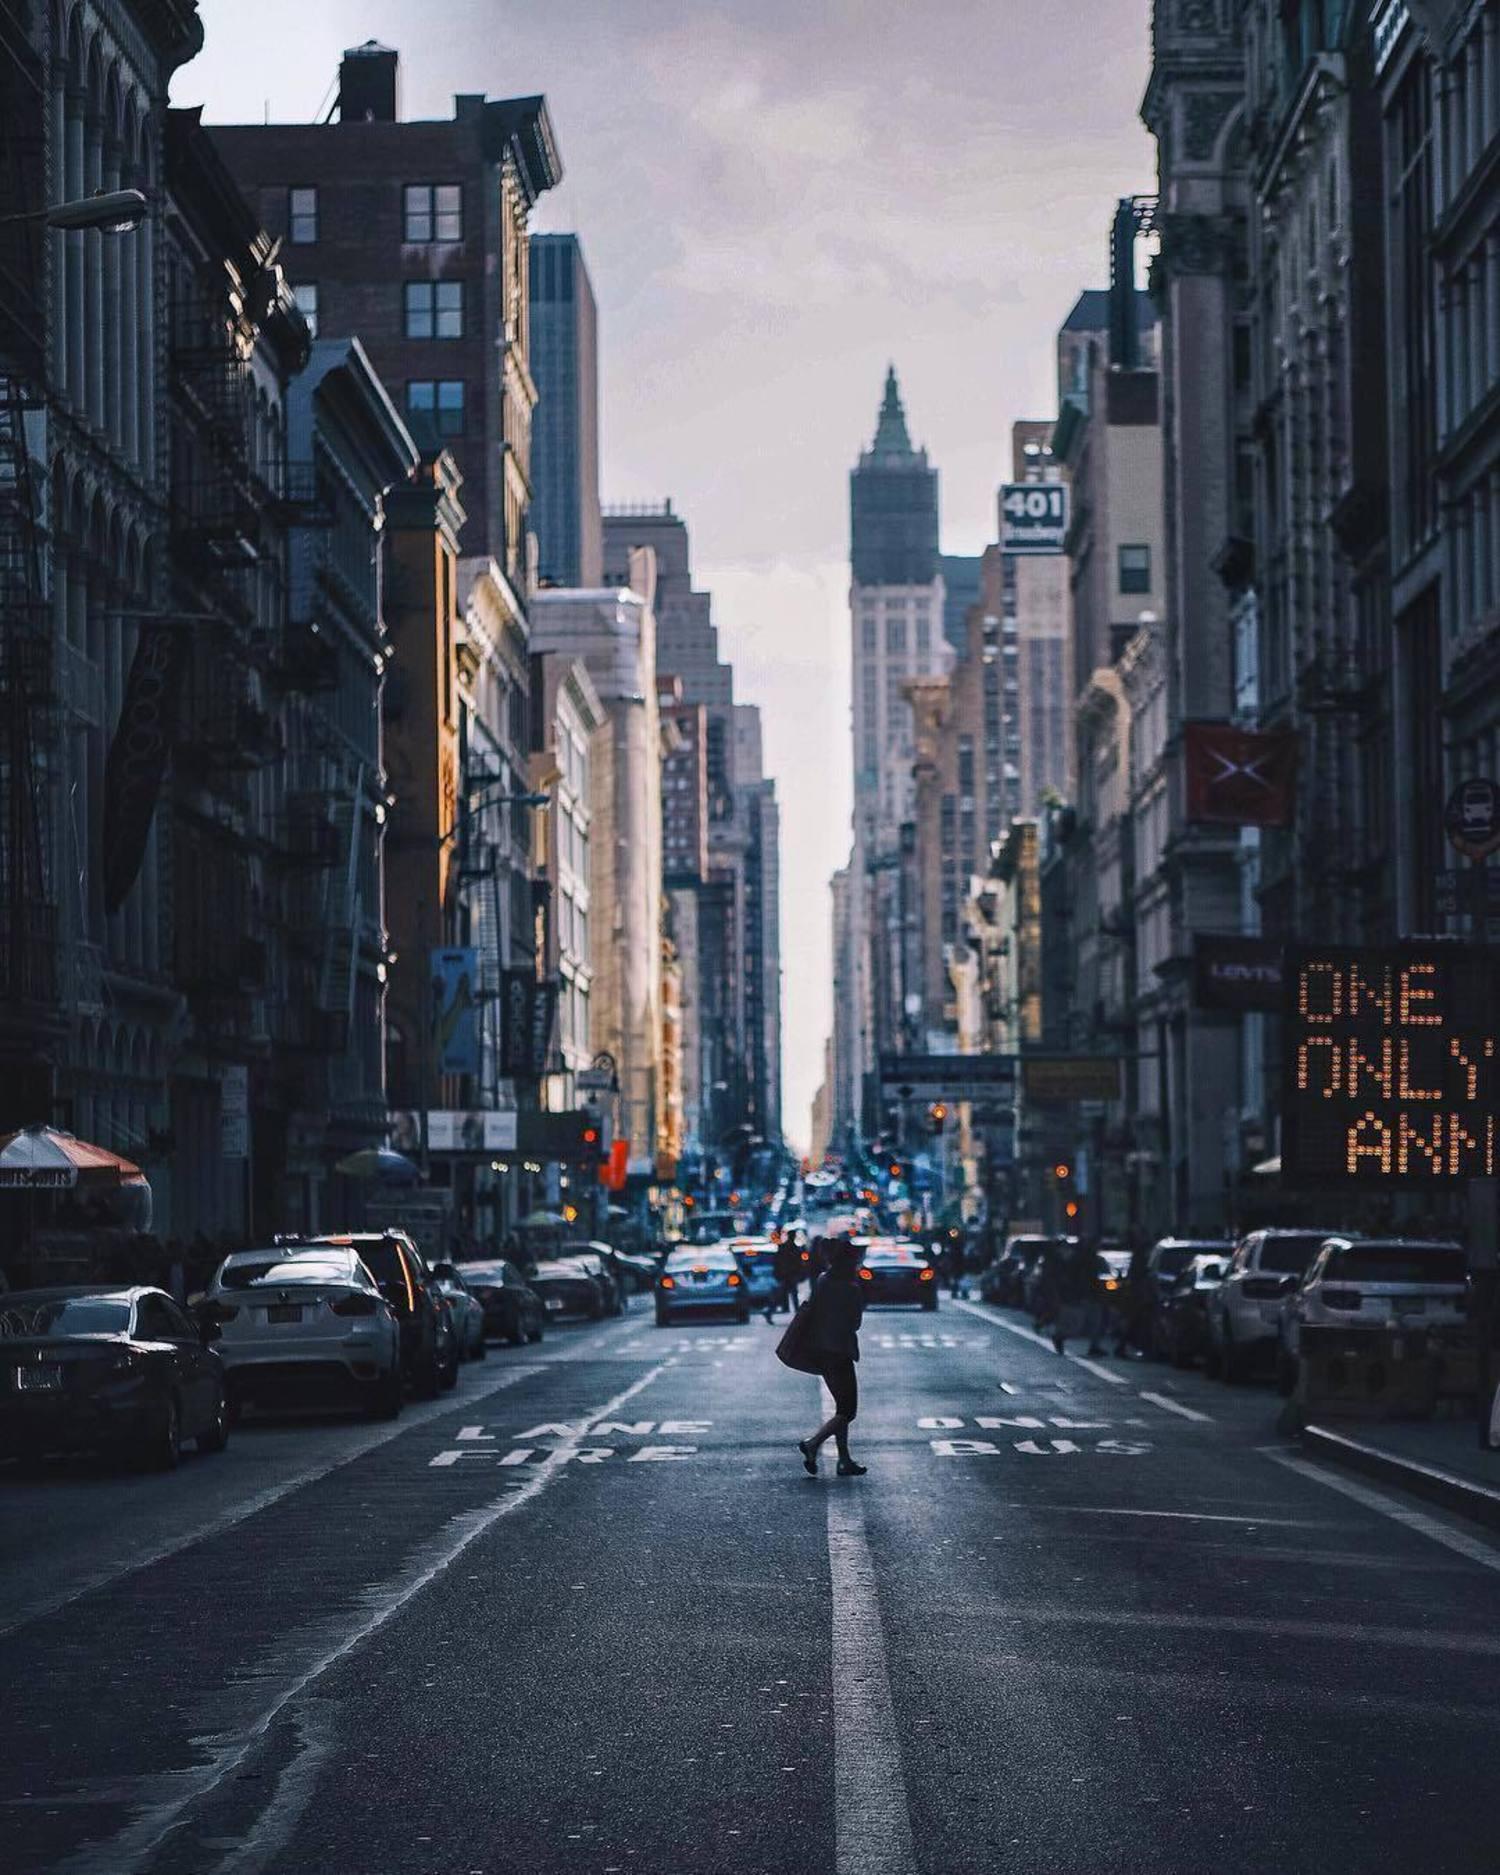 New York, New York. Photo via @golden2dew #viewingnyc #newyorkcity #newyork #nyc #rain